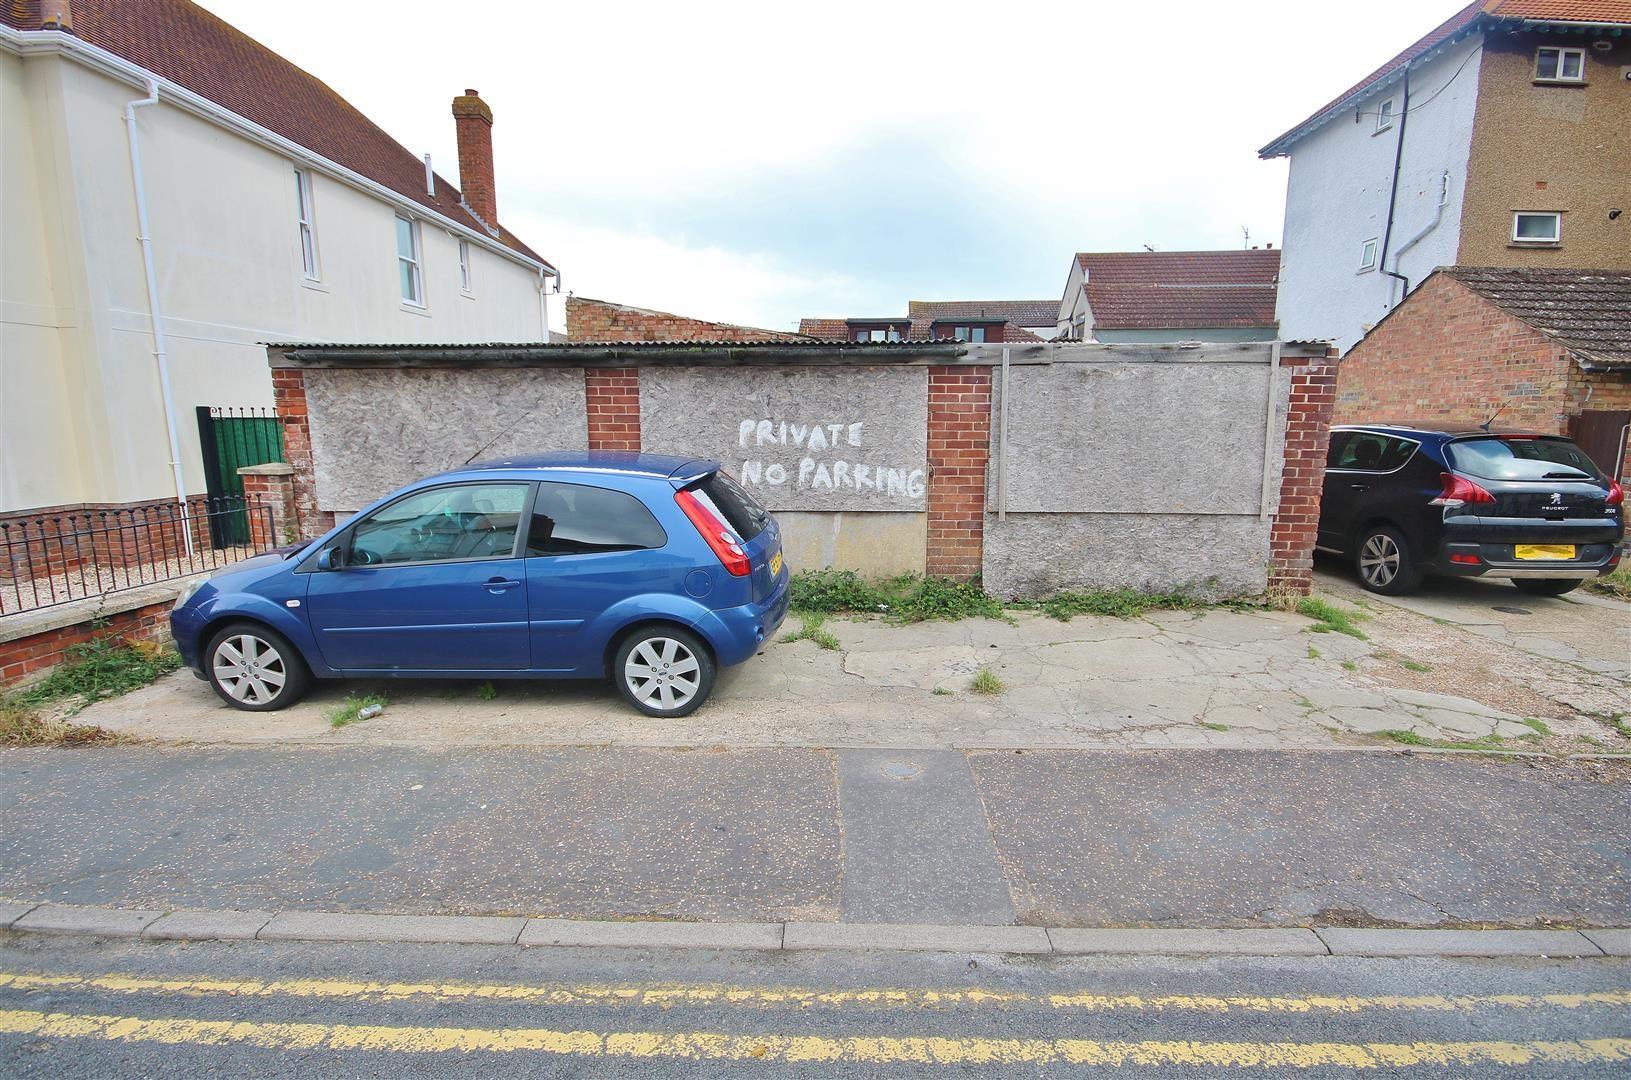 Property photo 1 of 8. Img_0028.Jpg